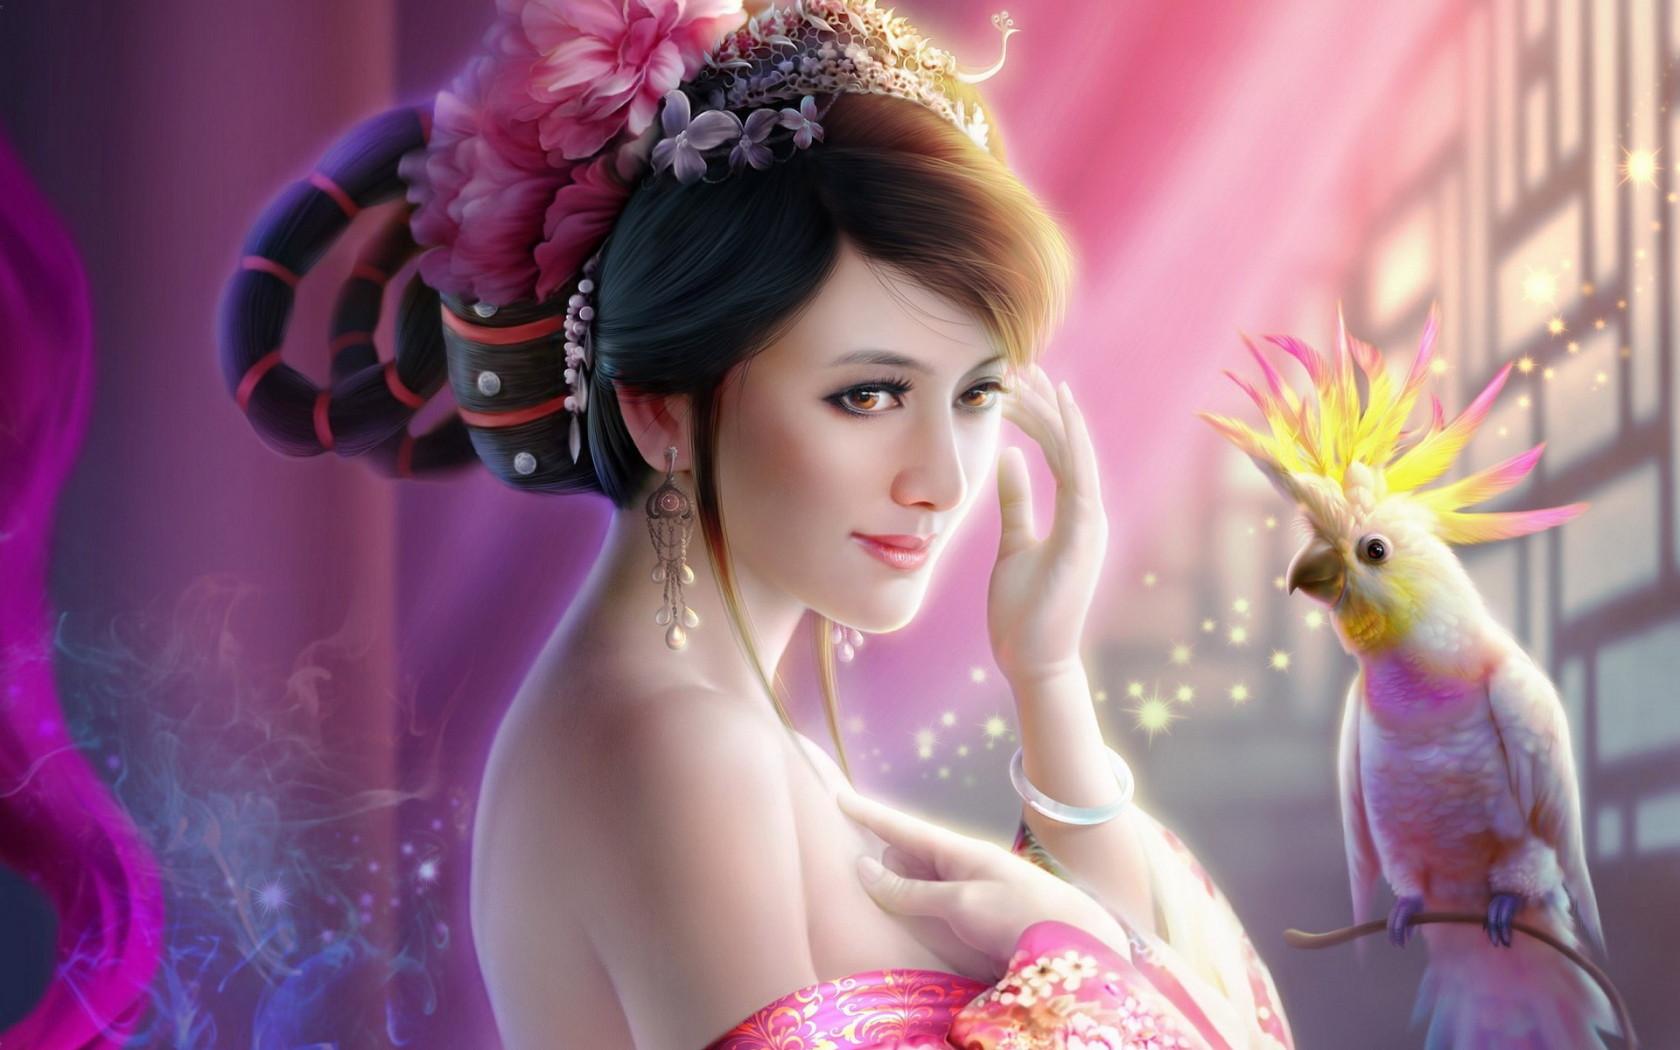 3D-fantasy-girl-wallpaper | 3d arts | Pinterest | Beautiful